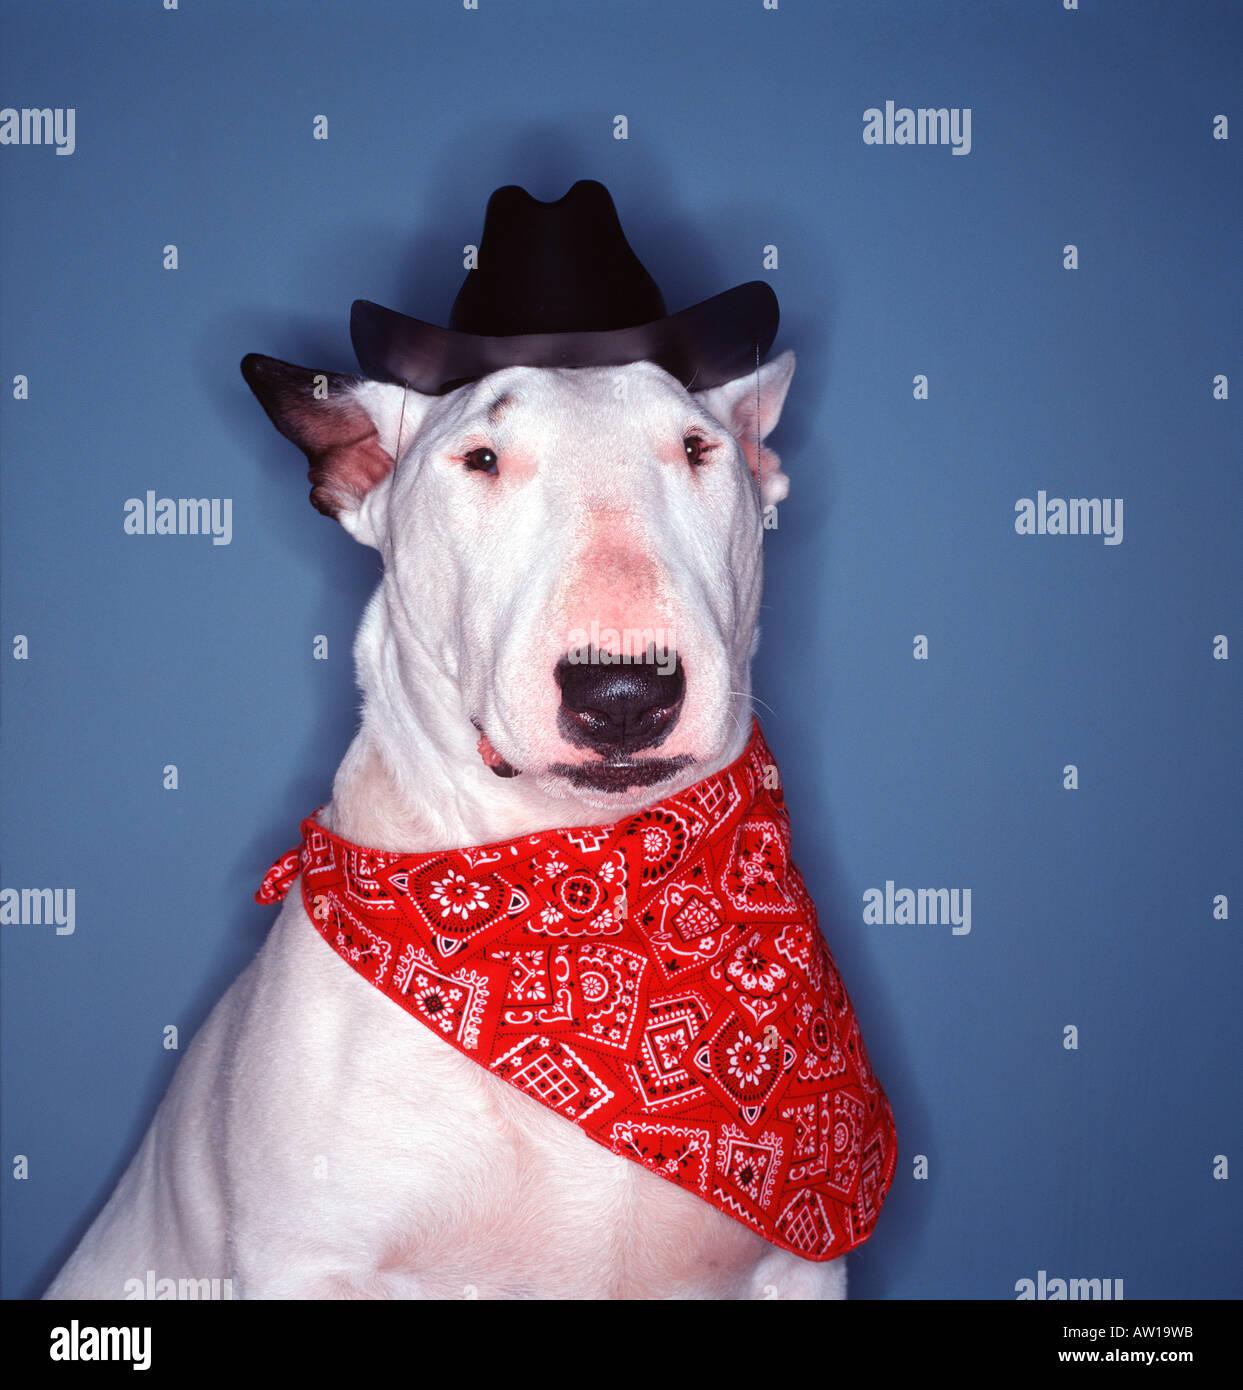 Dog Wearing Cowboy Hat and Bandana Stock Photo